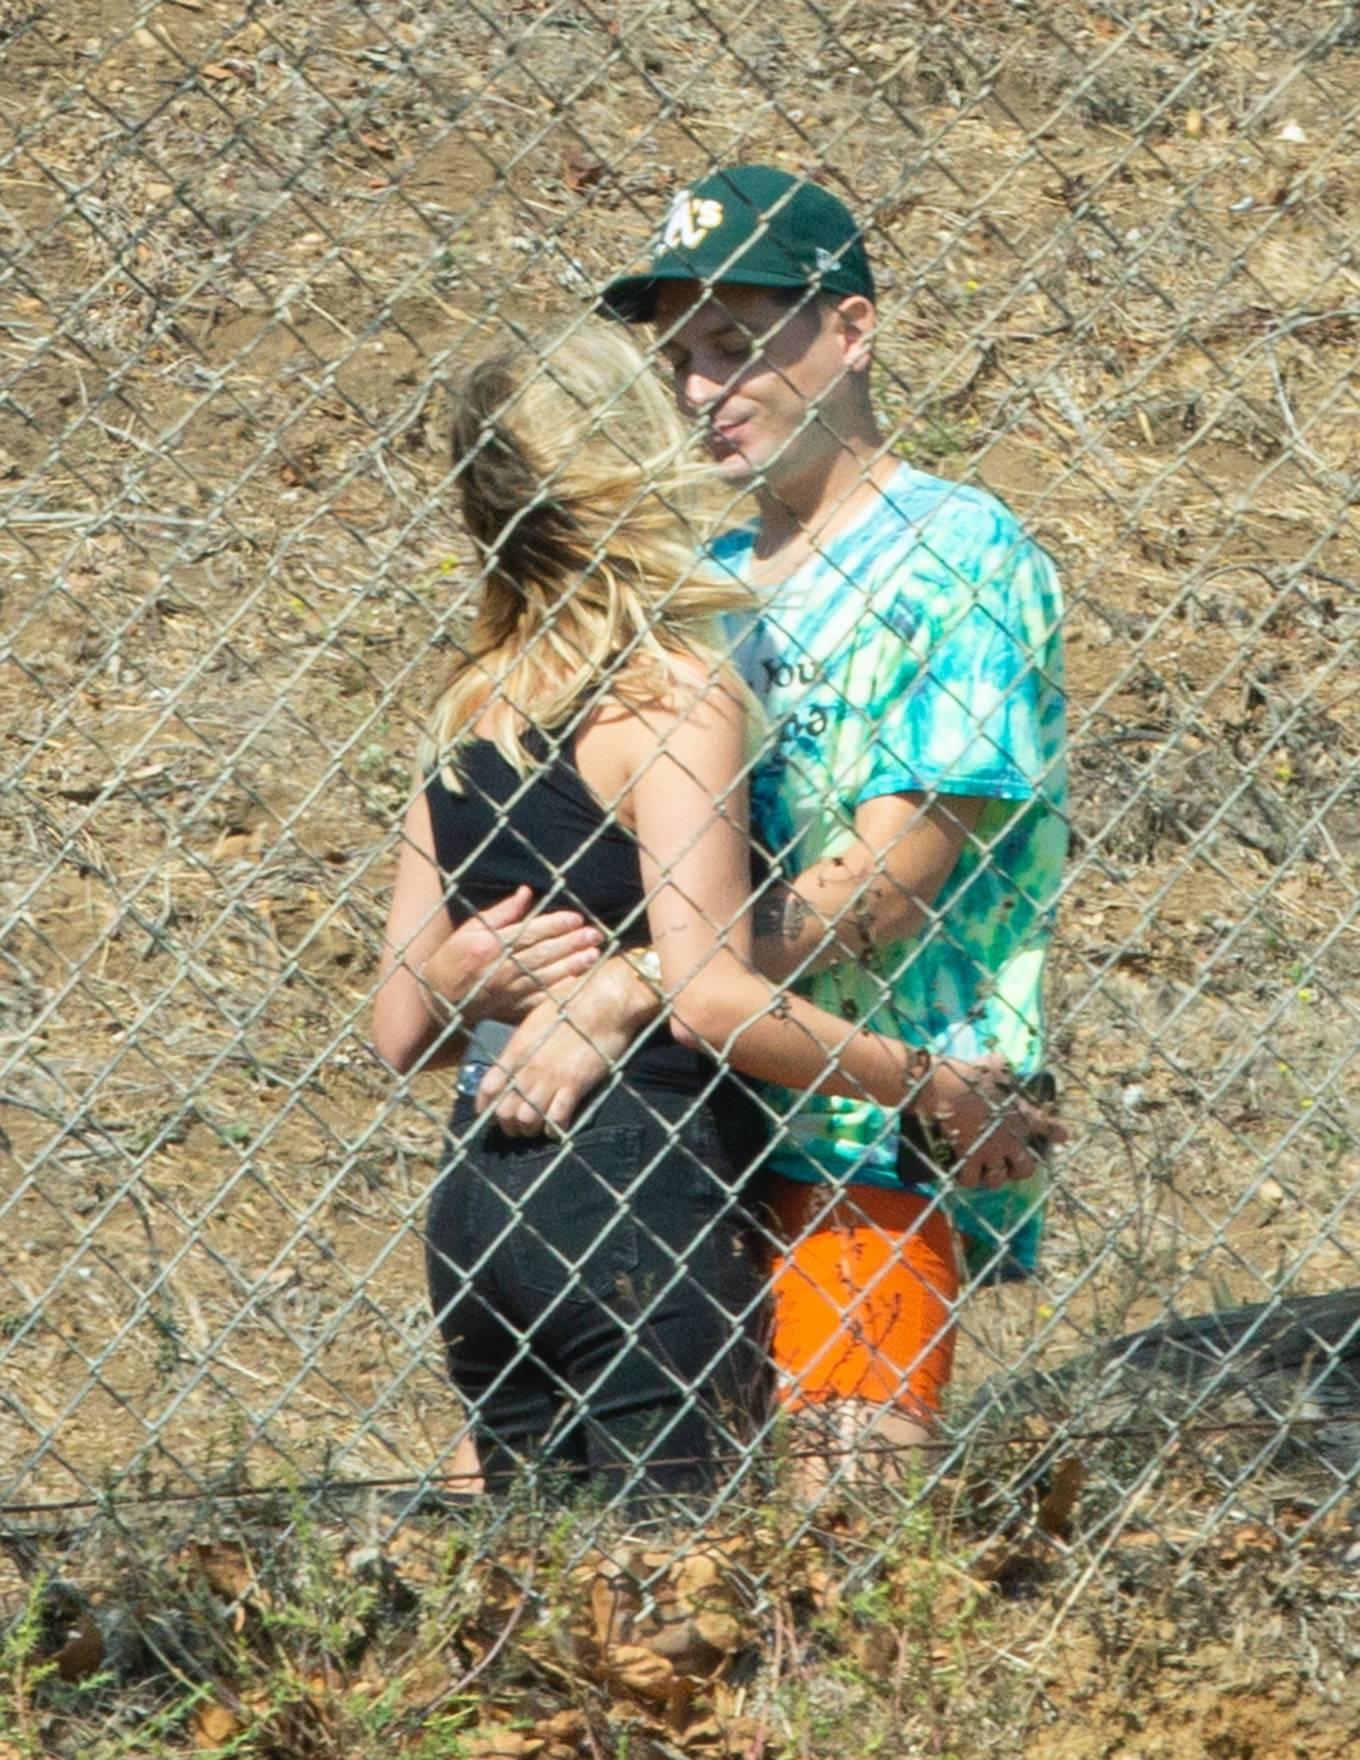 Ashley Benson 2020 : Ashley Benson and boyfriend G-Eazy as she arrives at his video shoot in Malibu-05